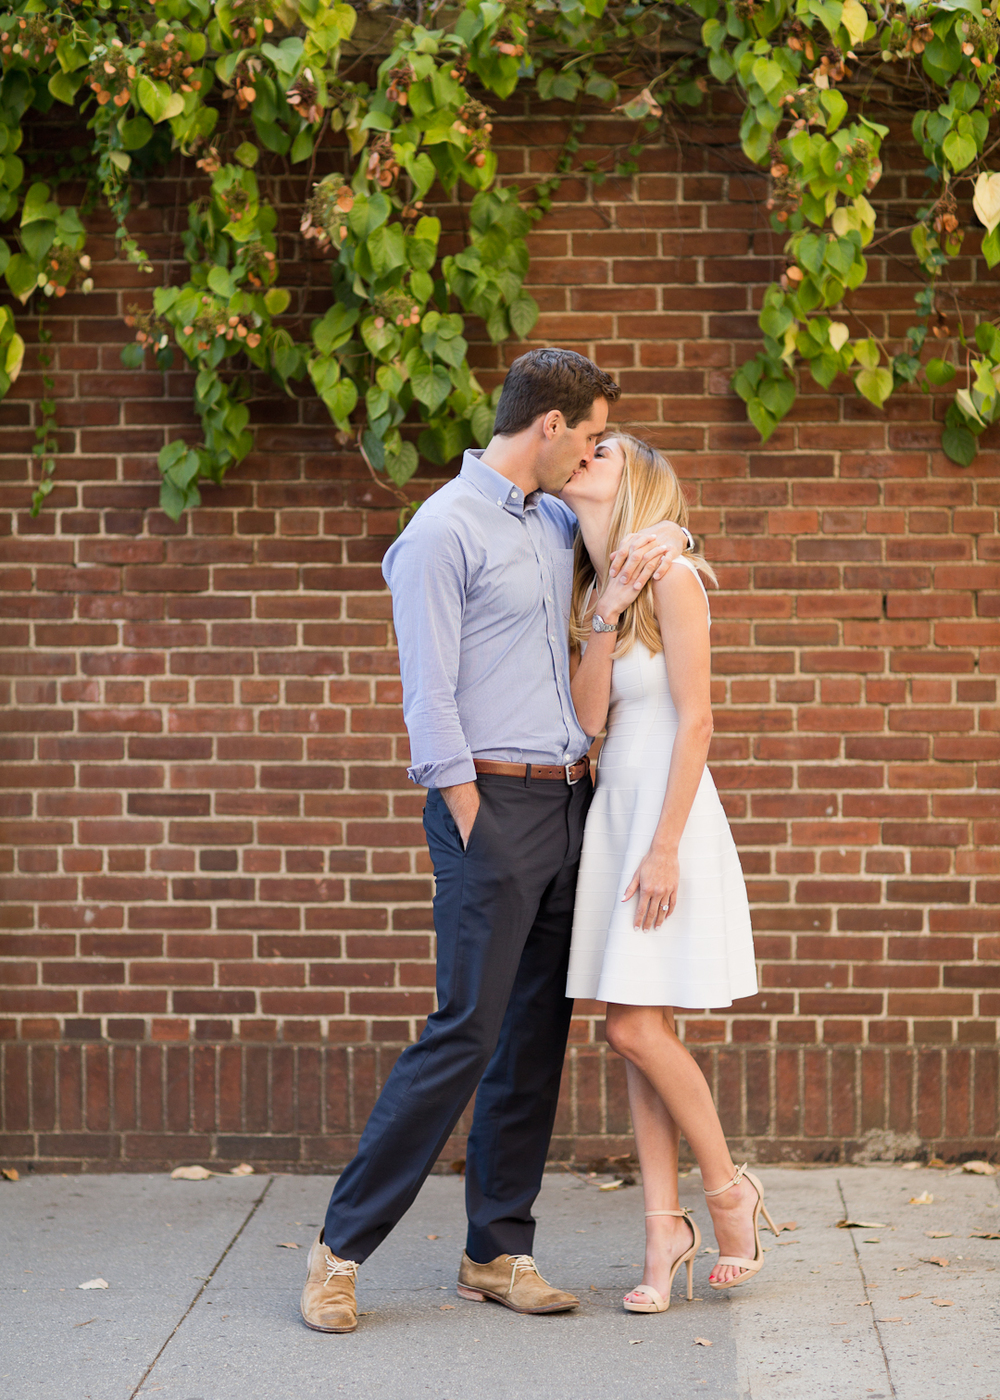 Melissa Kruse Photography - Daniece & Chris West Village Engagement Photos-71.jpg